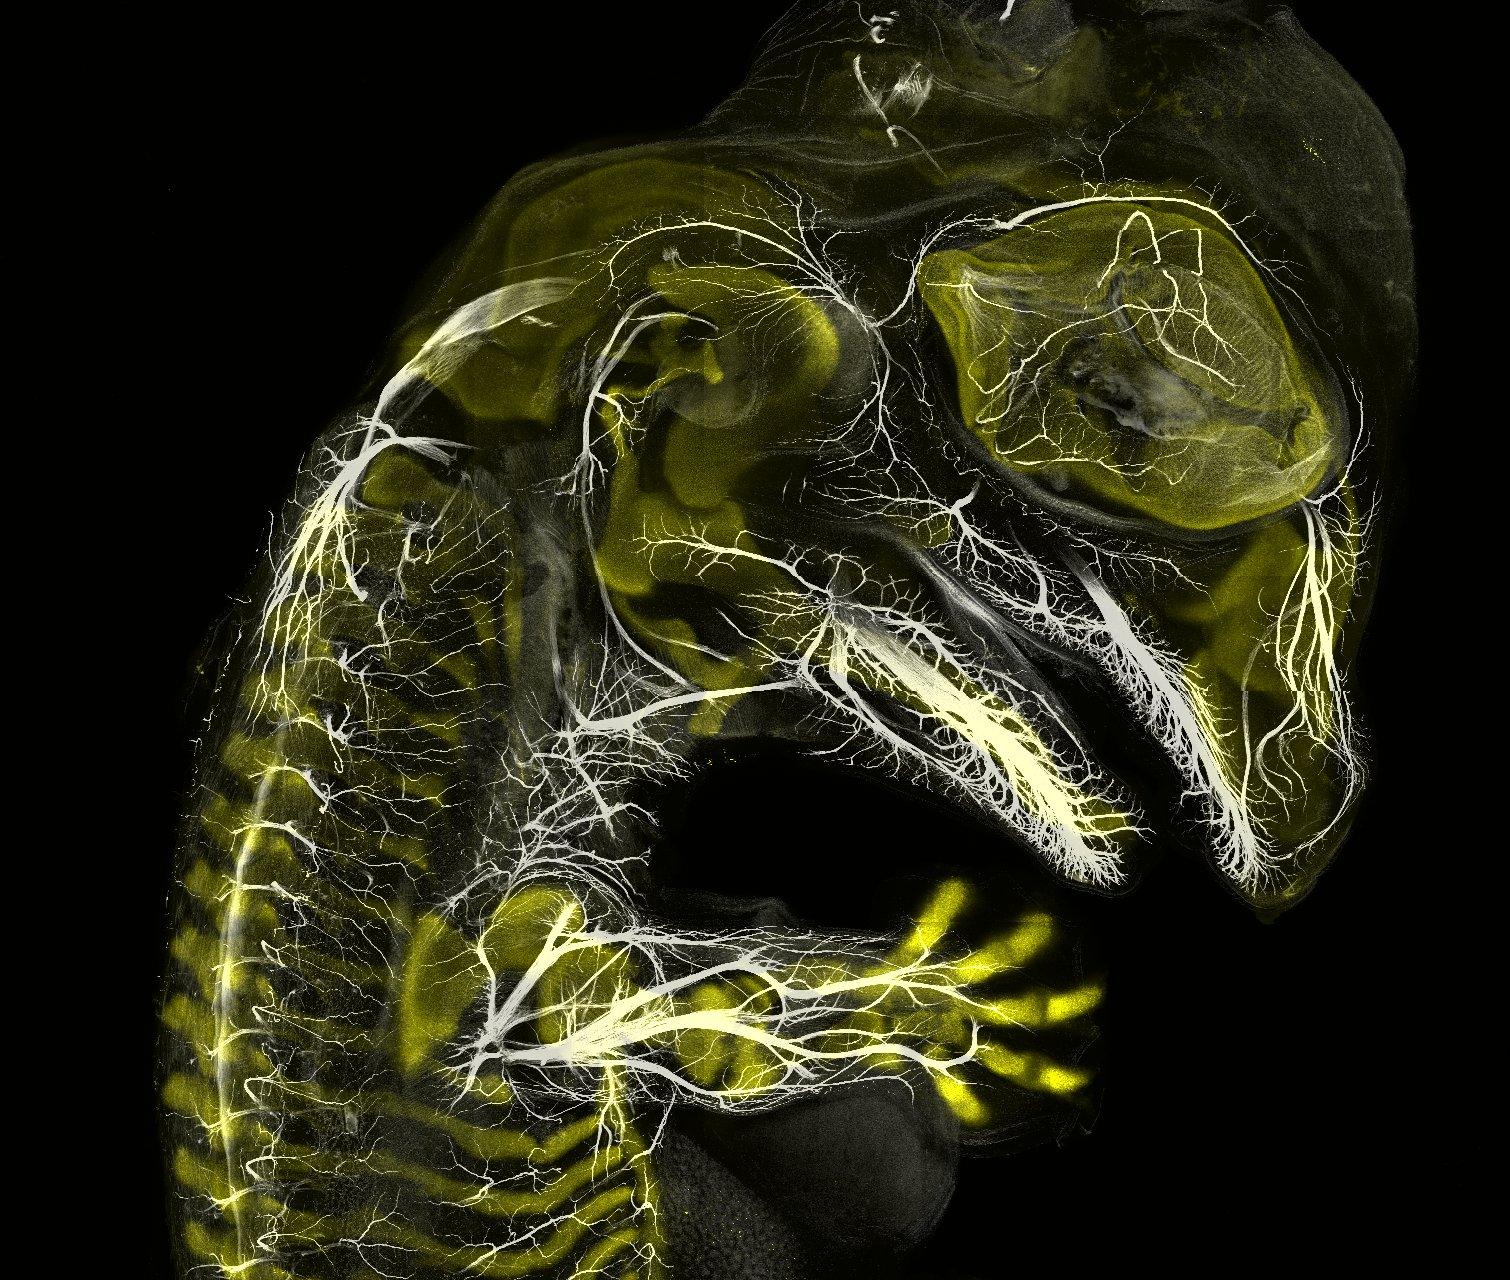 Alligator embryo